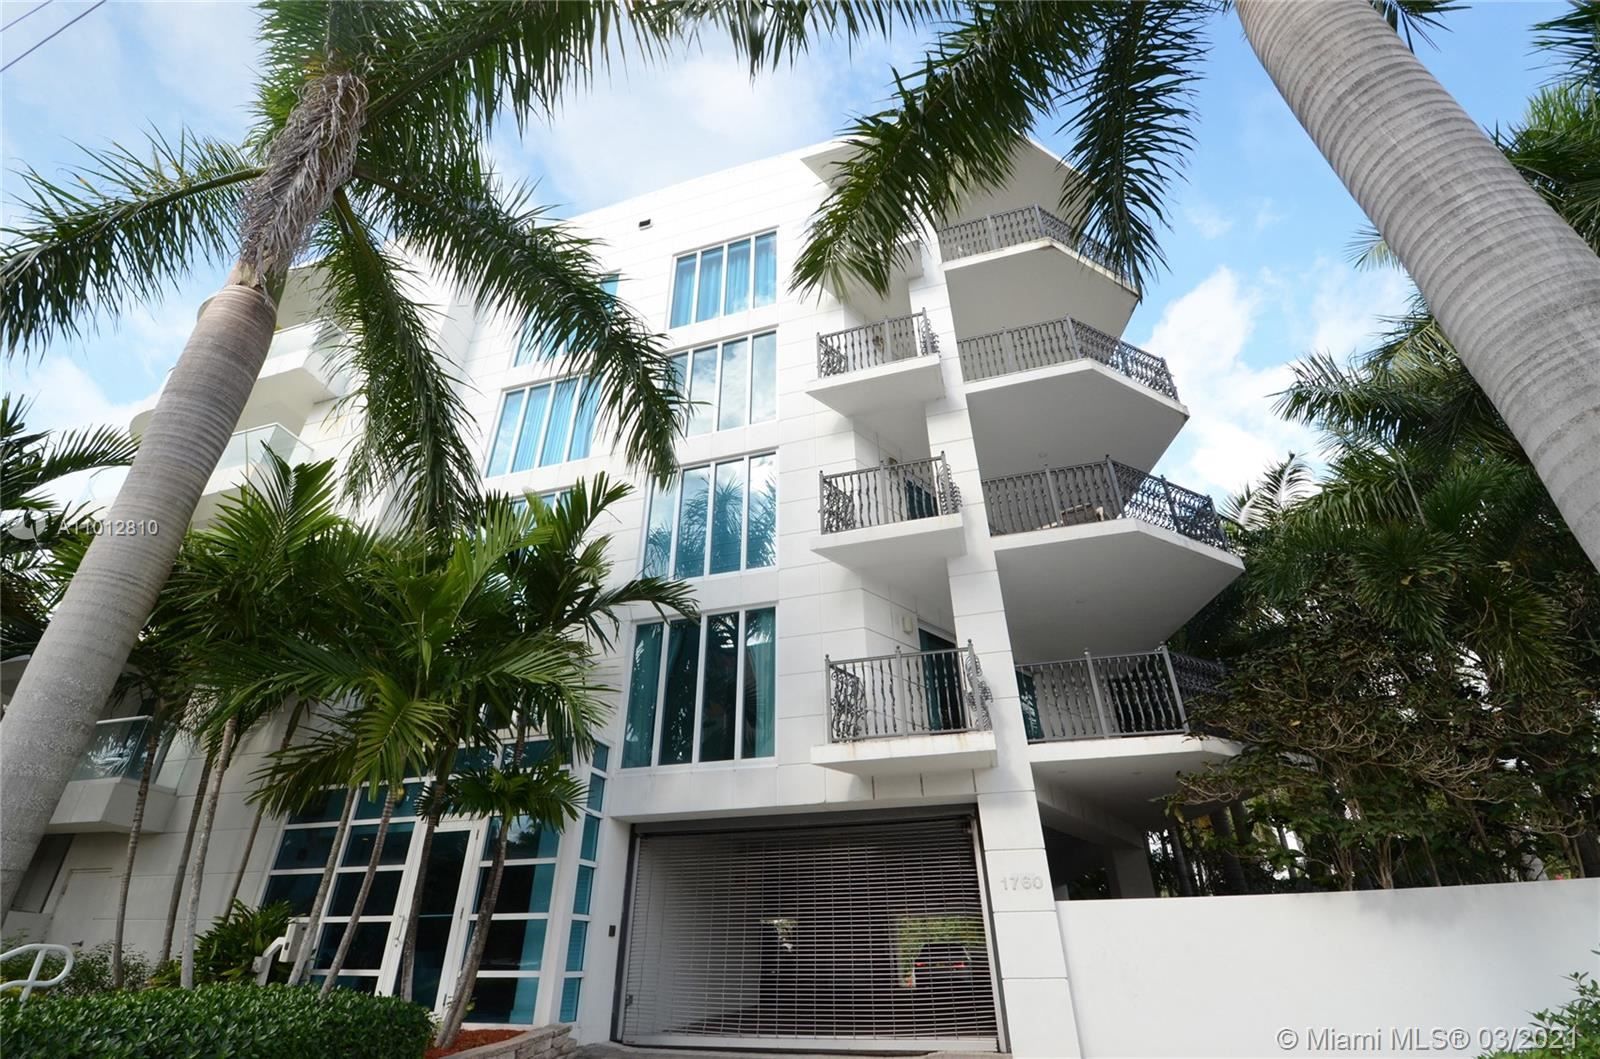 1760 E Las Olas Blvd #400, Fort Lauderdale, FL 33301 - #: A11012810